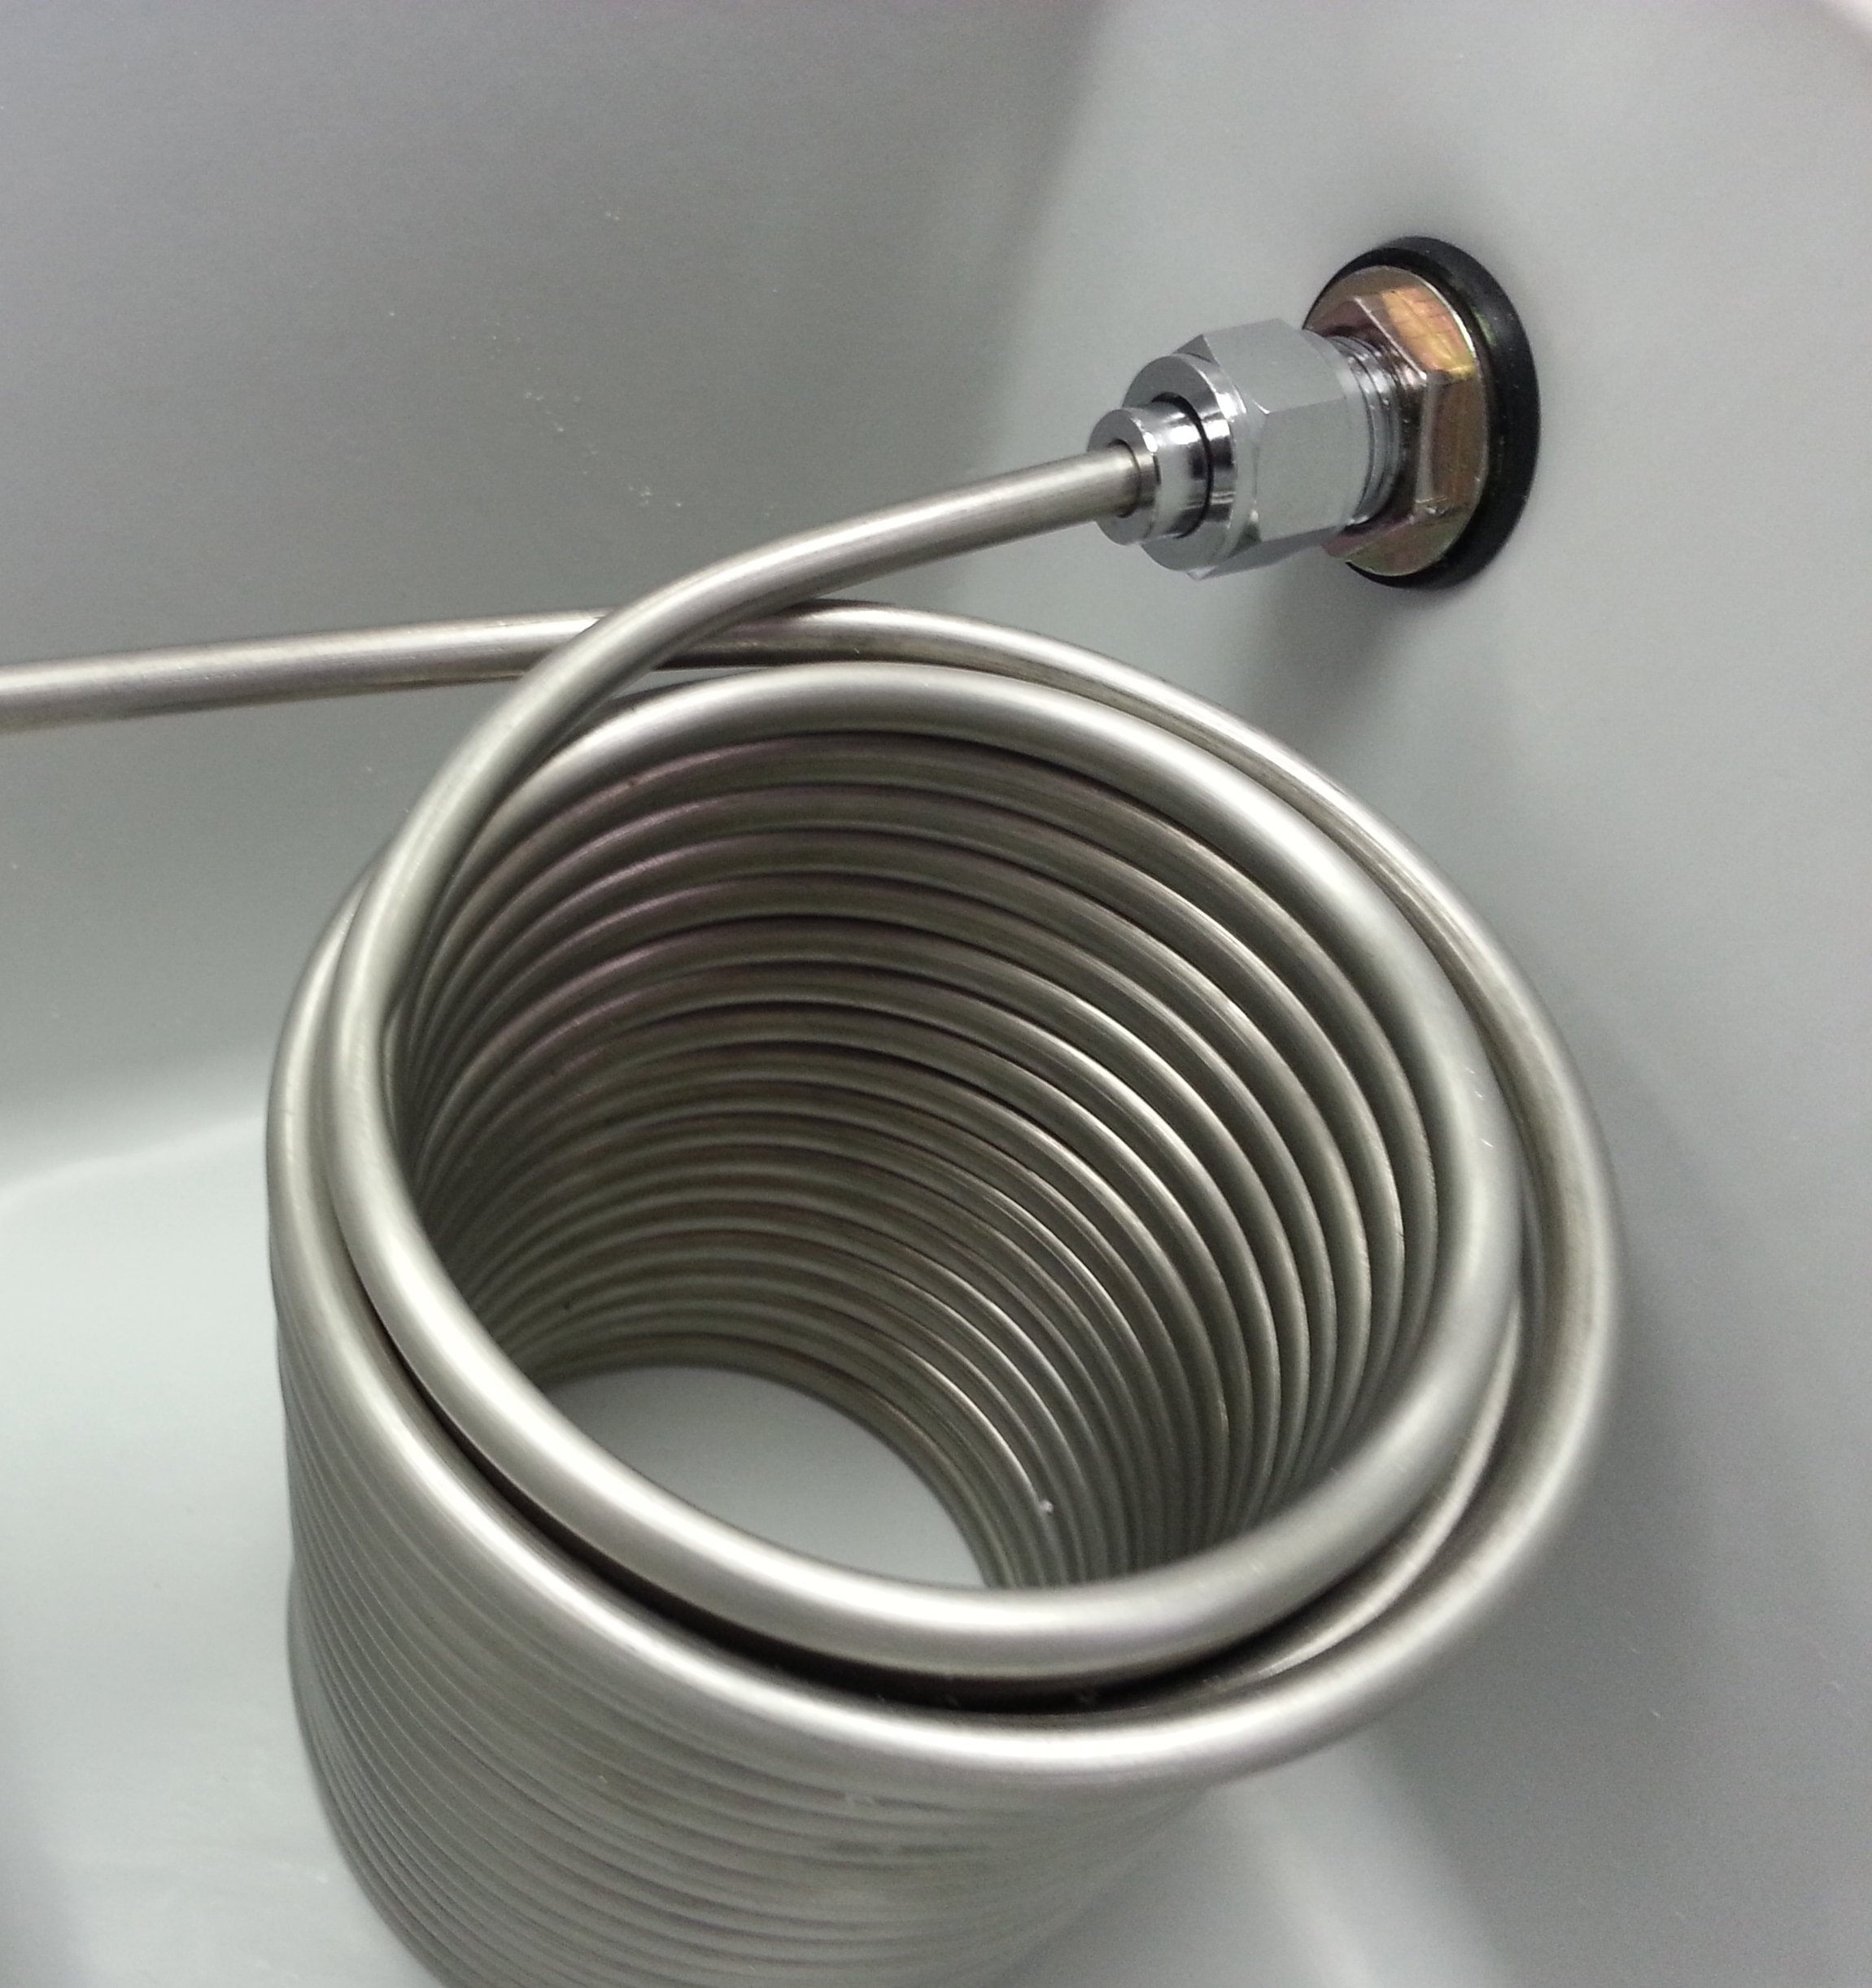 Bev Rite CJB48250 50' SS Coil Double Faucet Jockey box, 48 quart Cooler (2 Lines) Blue or Red